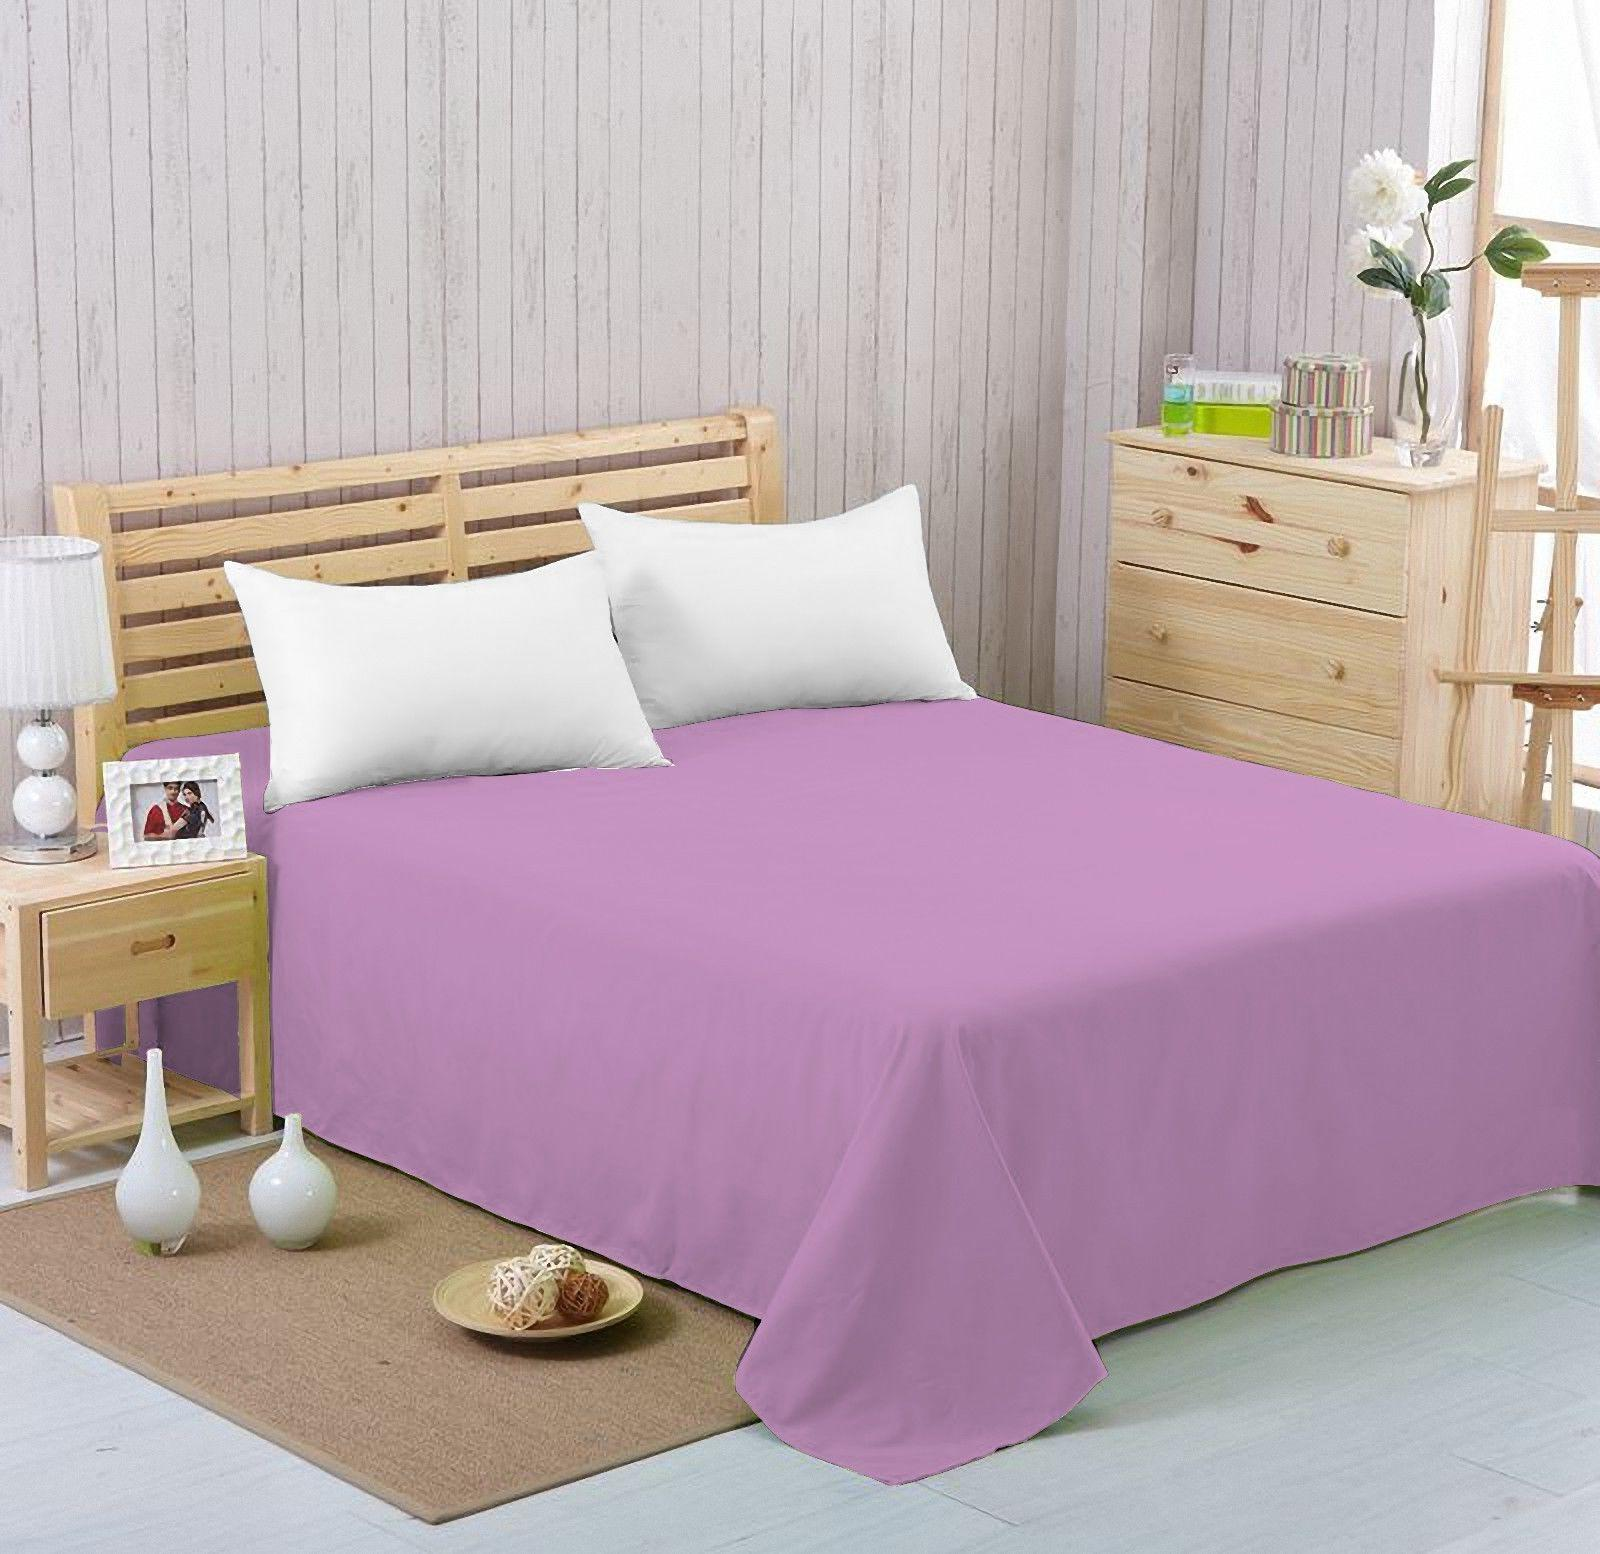 Flat Soft,Breathable& Comfortable Microfiber ,Hotel